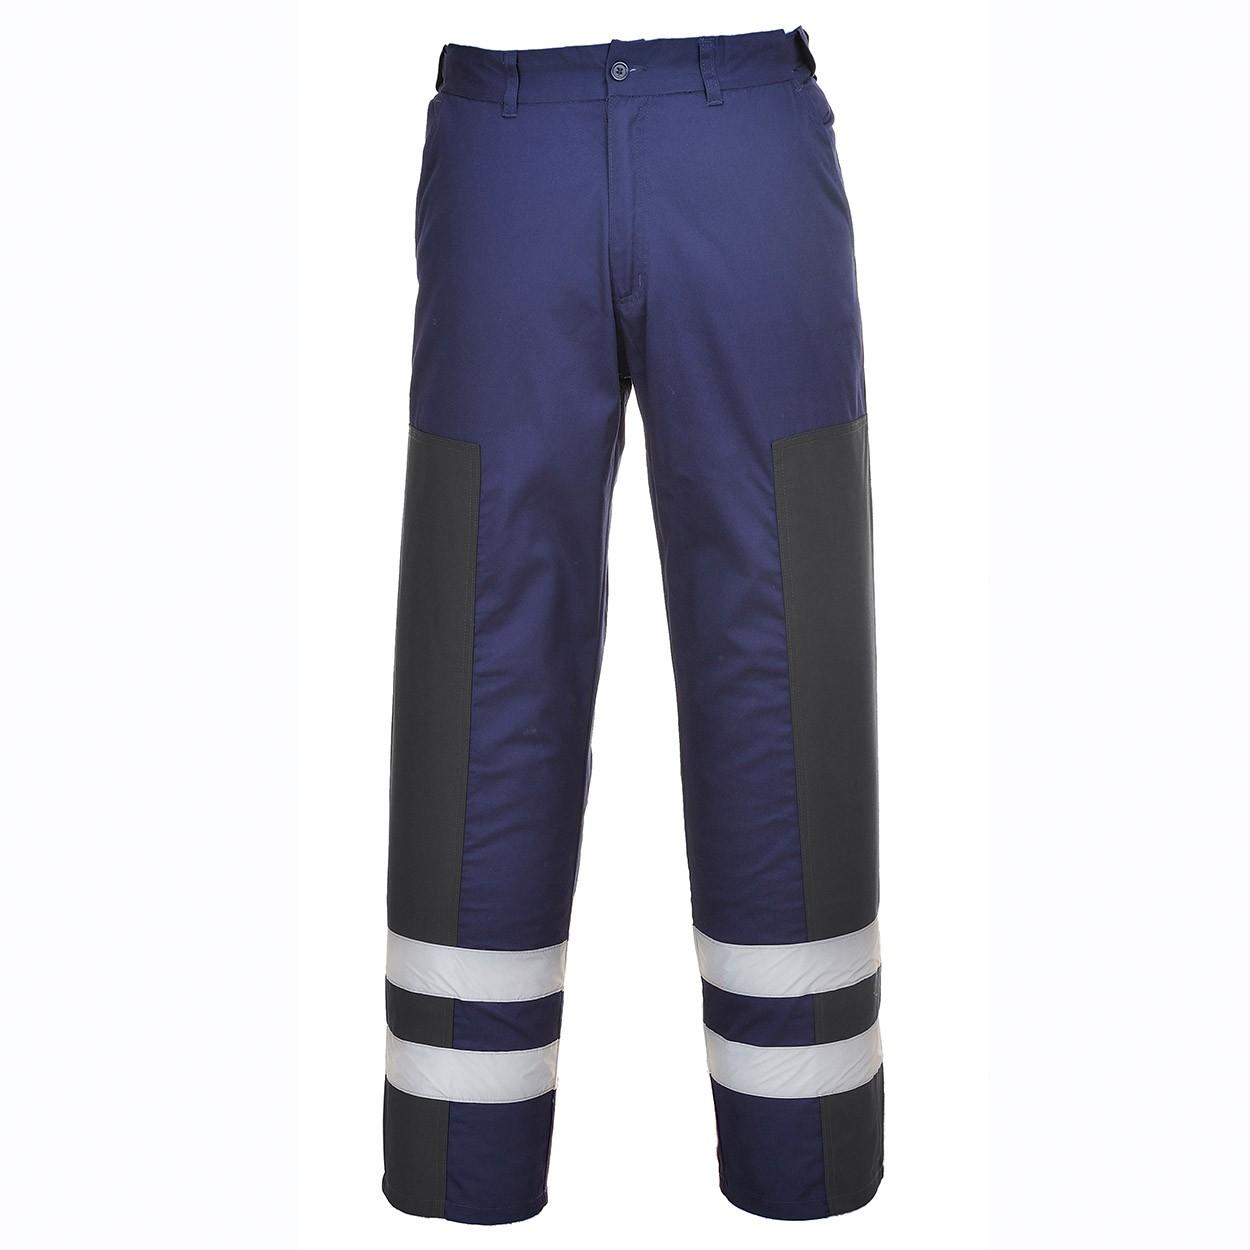 ballistic-trouser-cw-hi-viz